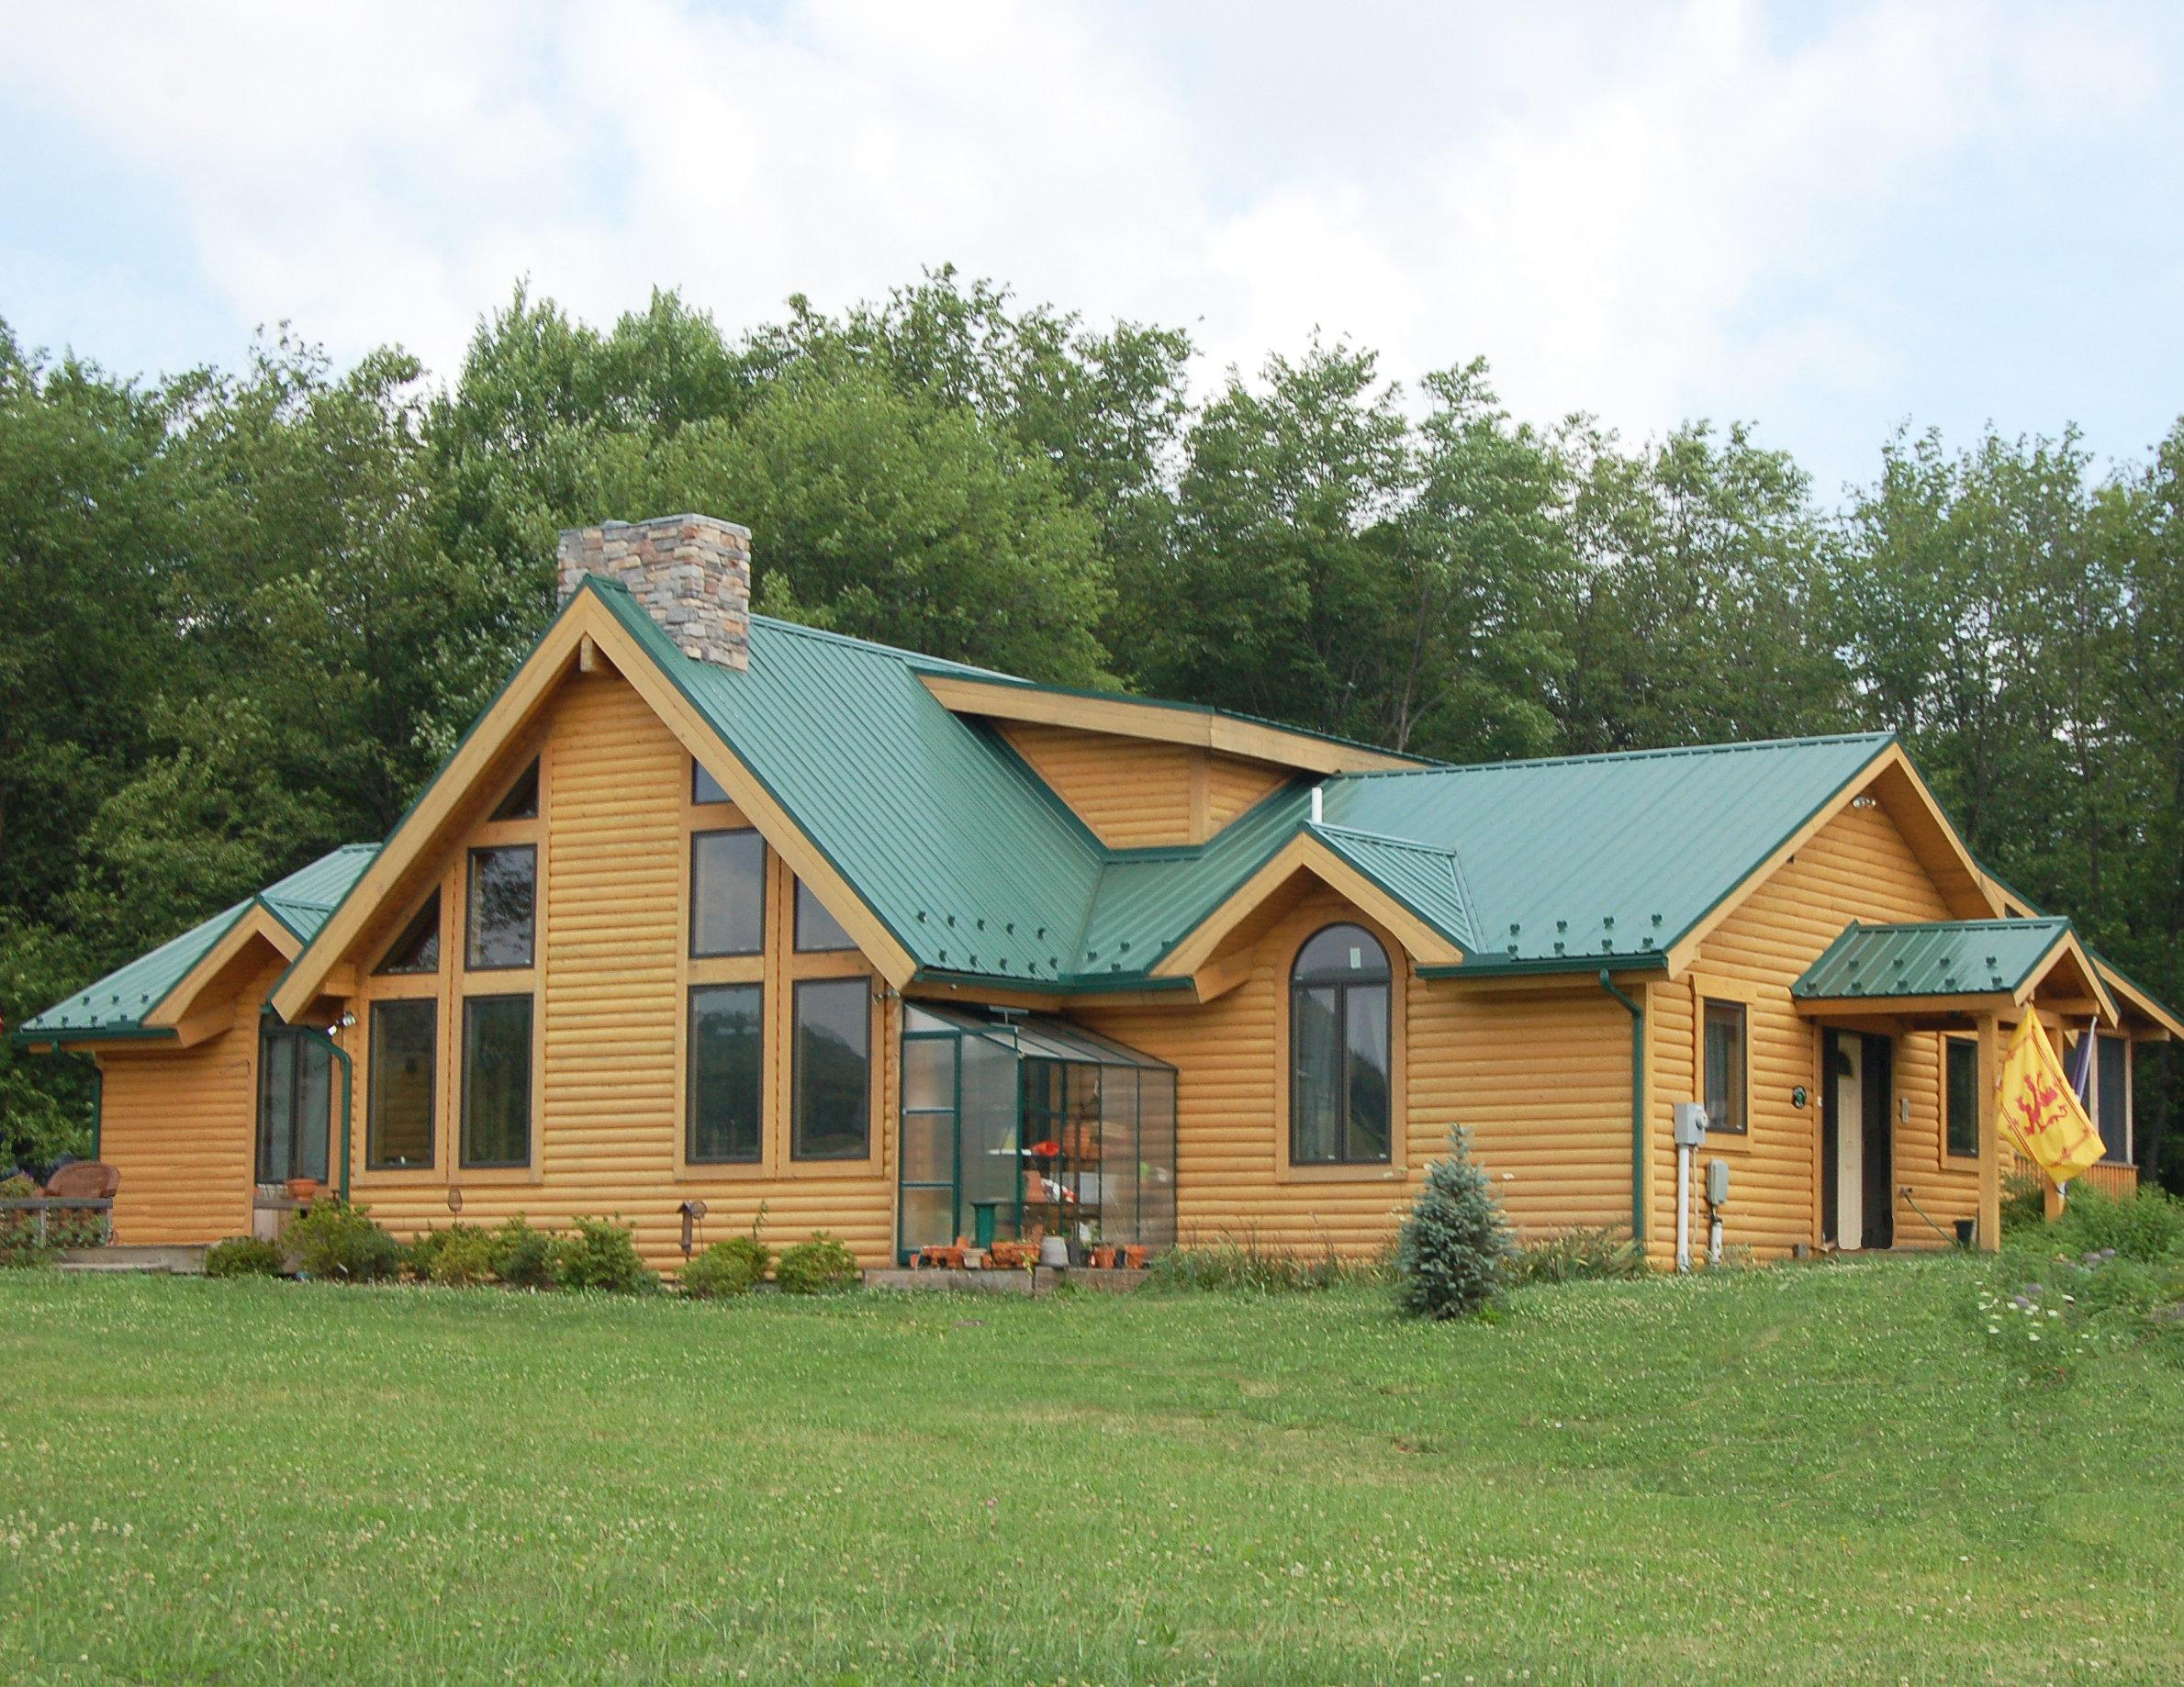 Kentucky Home Plans House Design Plans